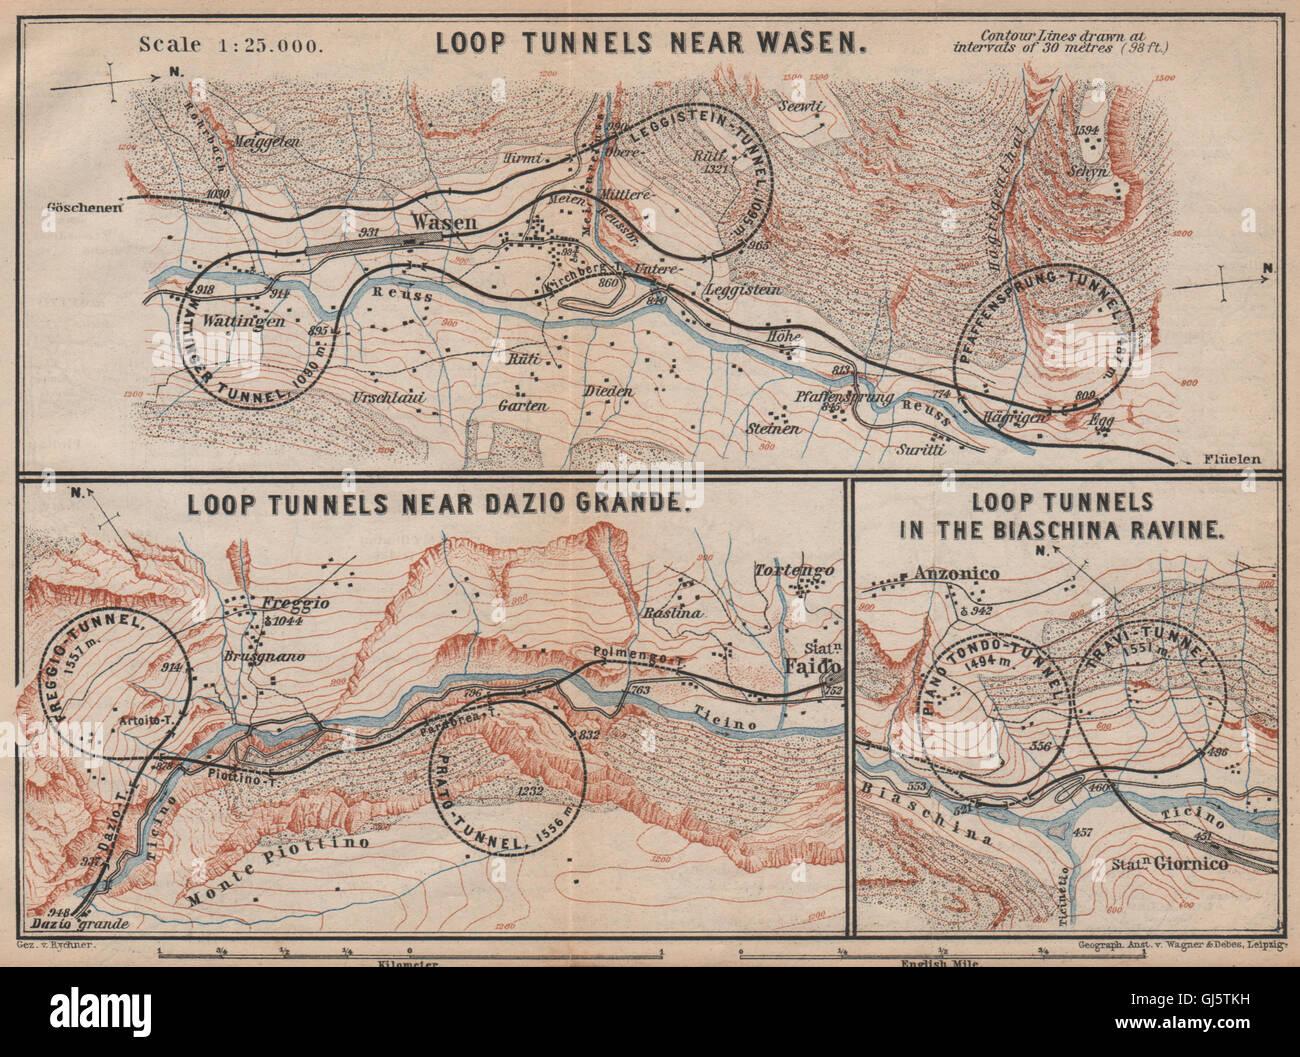 ST GOTTHARD RAILWAY SPIRAL/LOOP TUNNELS Wassen Freggio Prato Biaschina, 1893 map Stock Photo